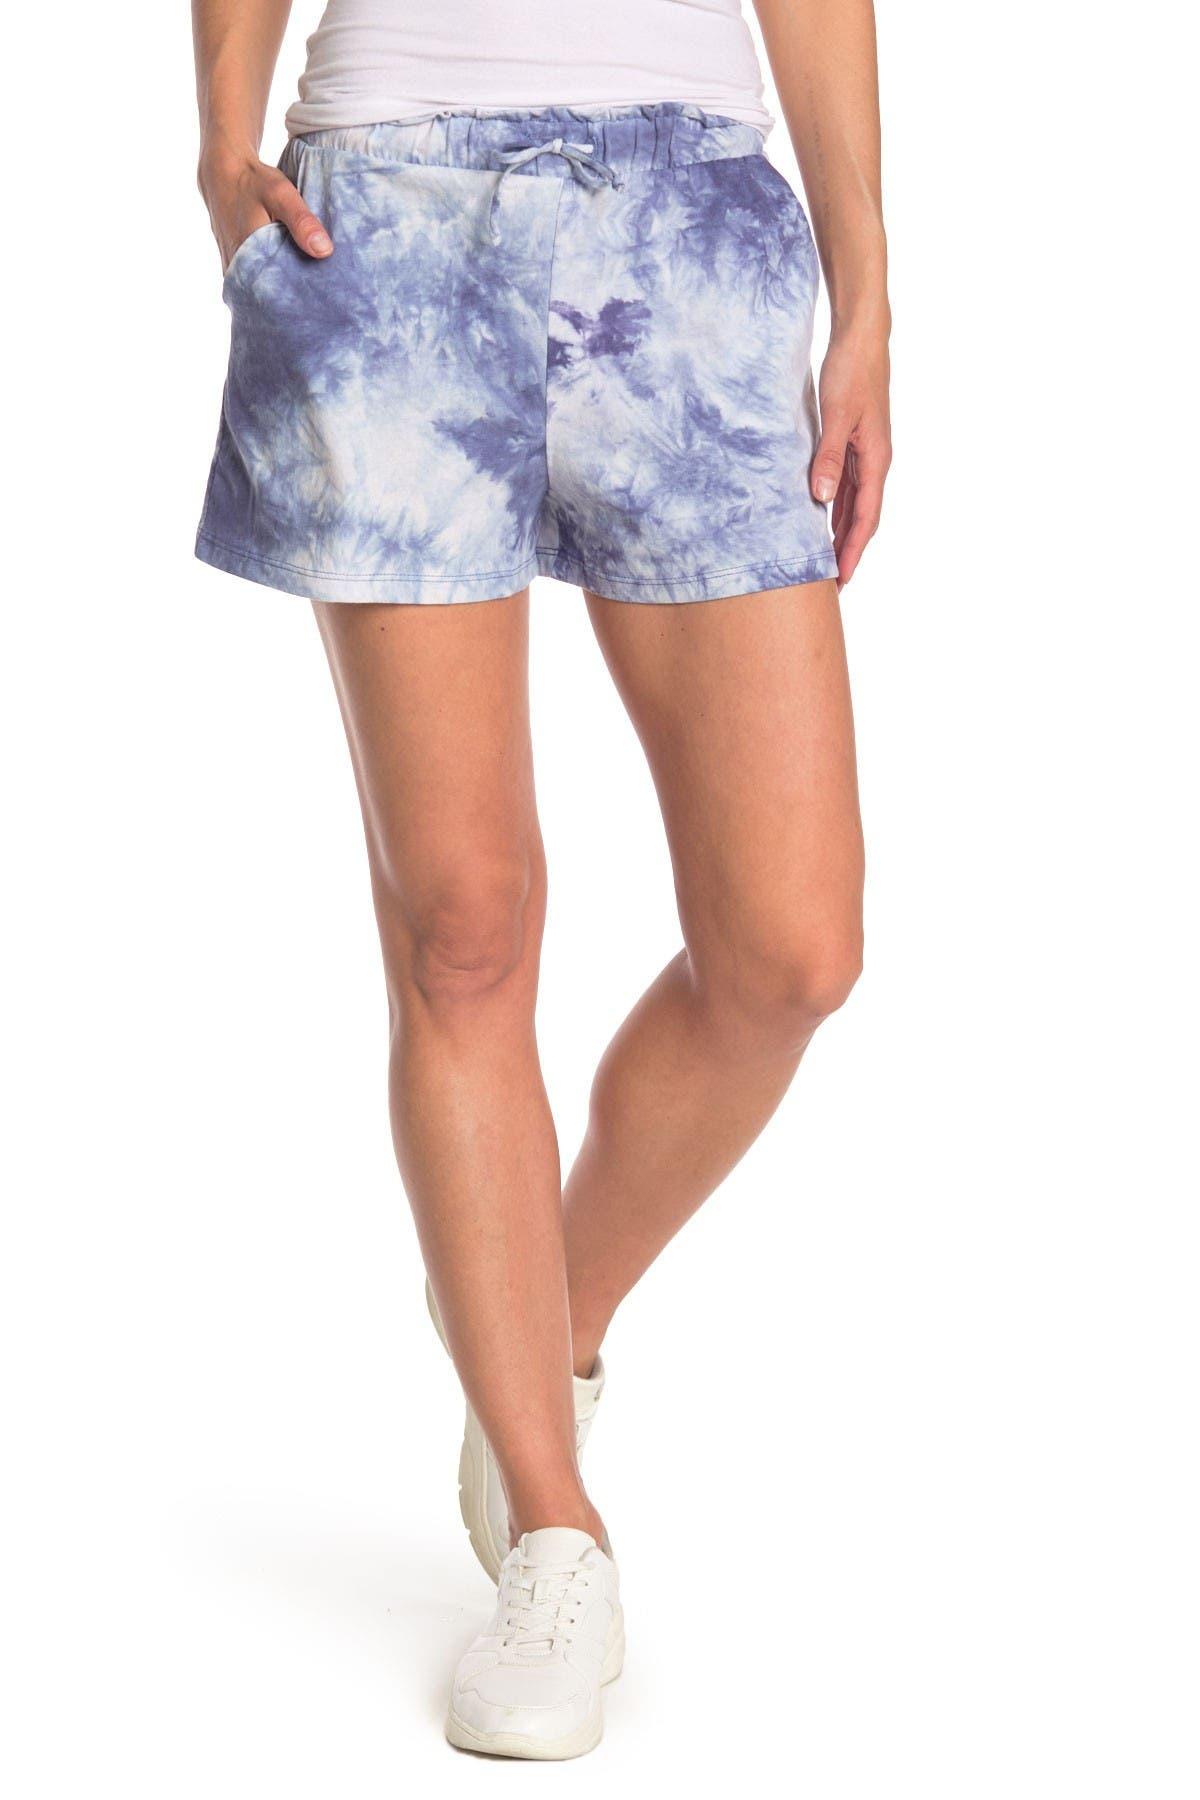 Image of Socialite Tie Dye Print Shorts